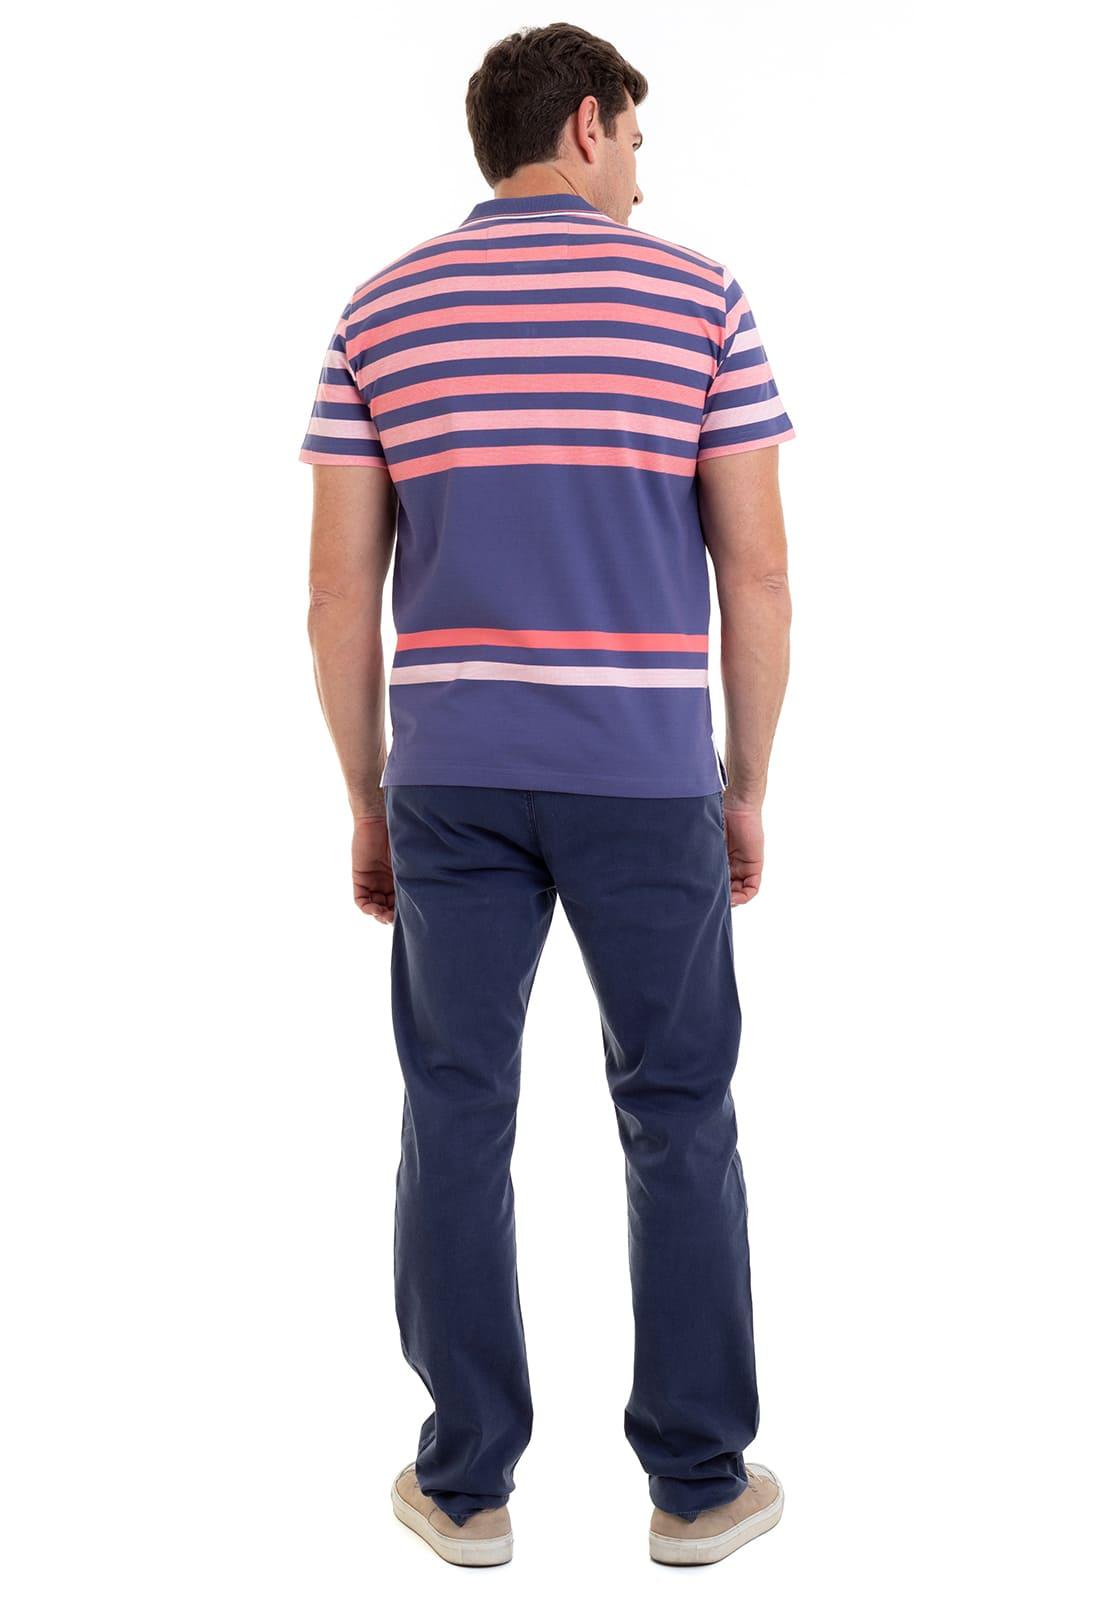 Camisa Polo Masculina Listrada Hifen Violeta